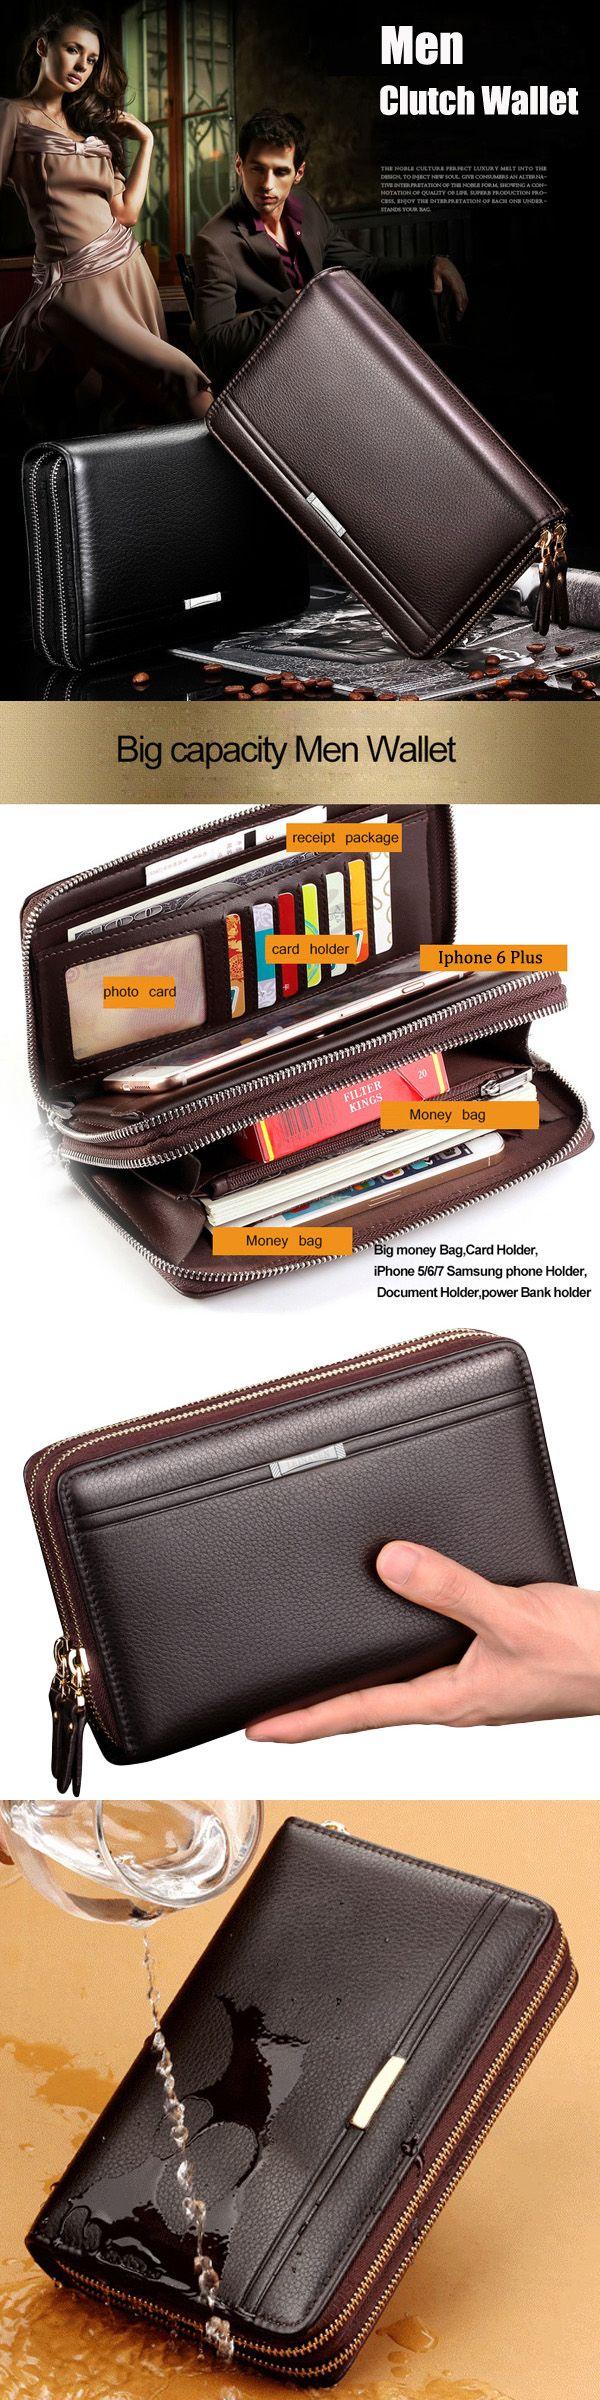 US$20.68 Waterproof PU Leather Clutch Bag_ Men Wallet_ 7 Card Holders Coin Bag_ Phone Bag For Men